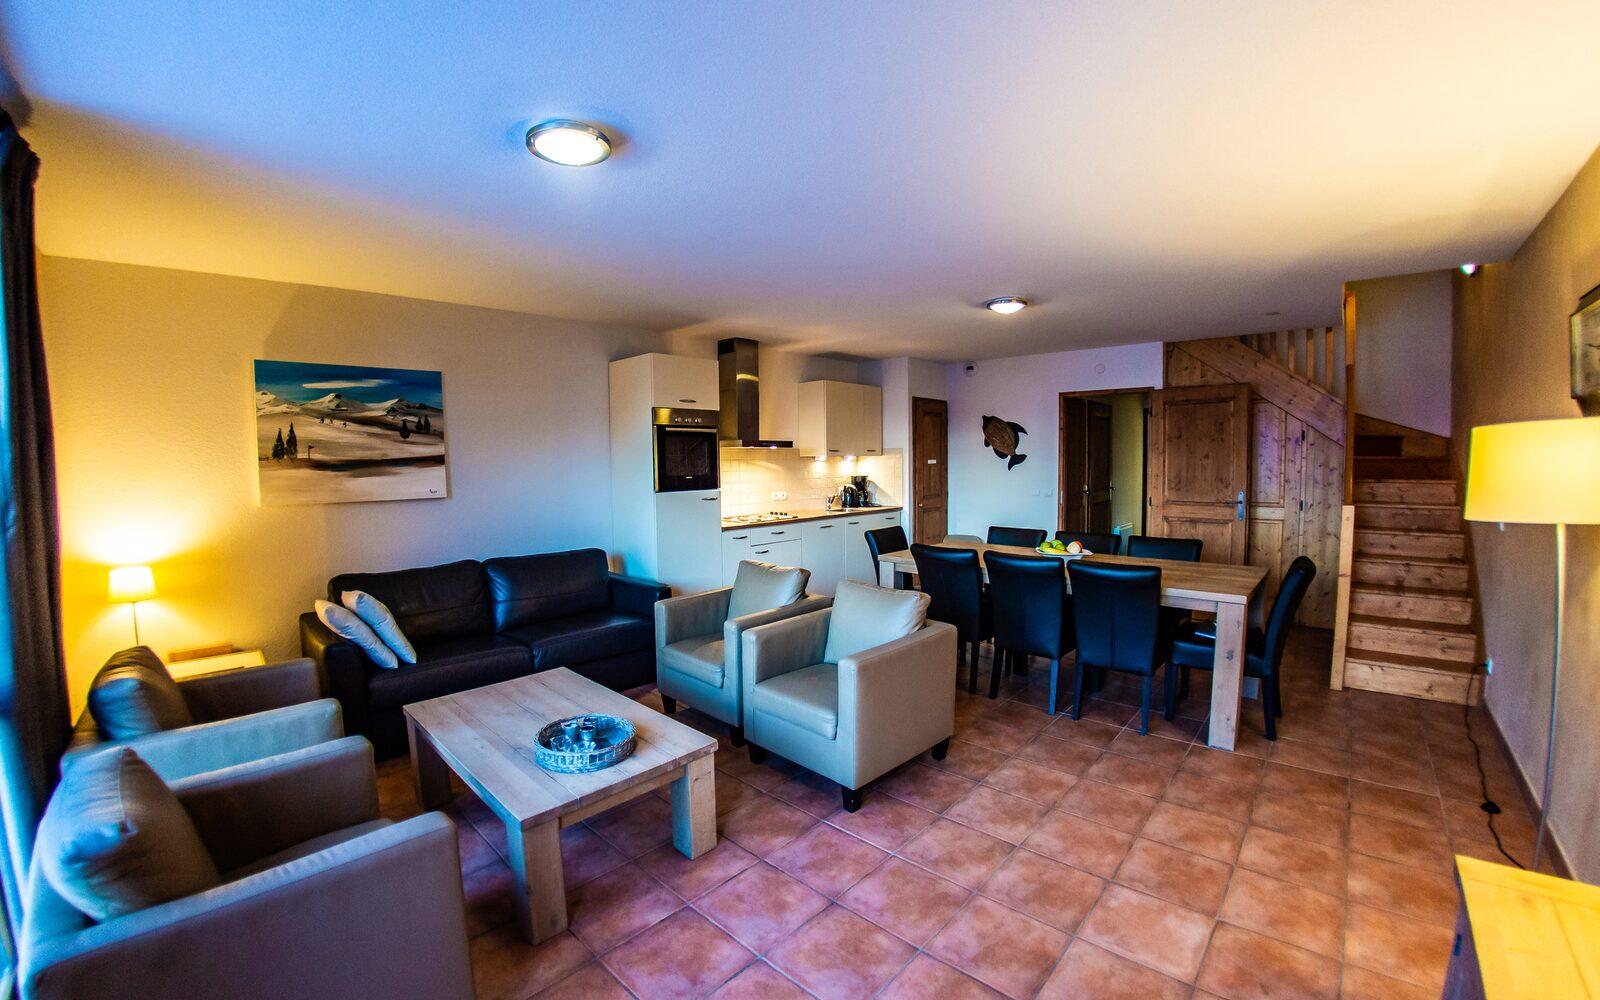 3-kamer appartement + cabine/vide | 8 personen